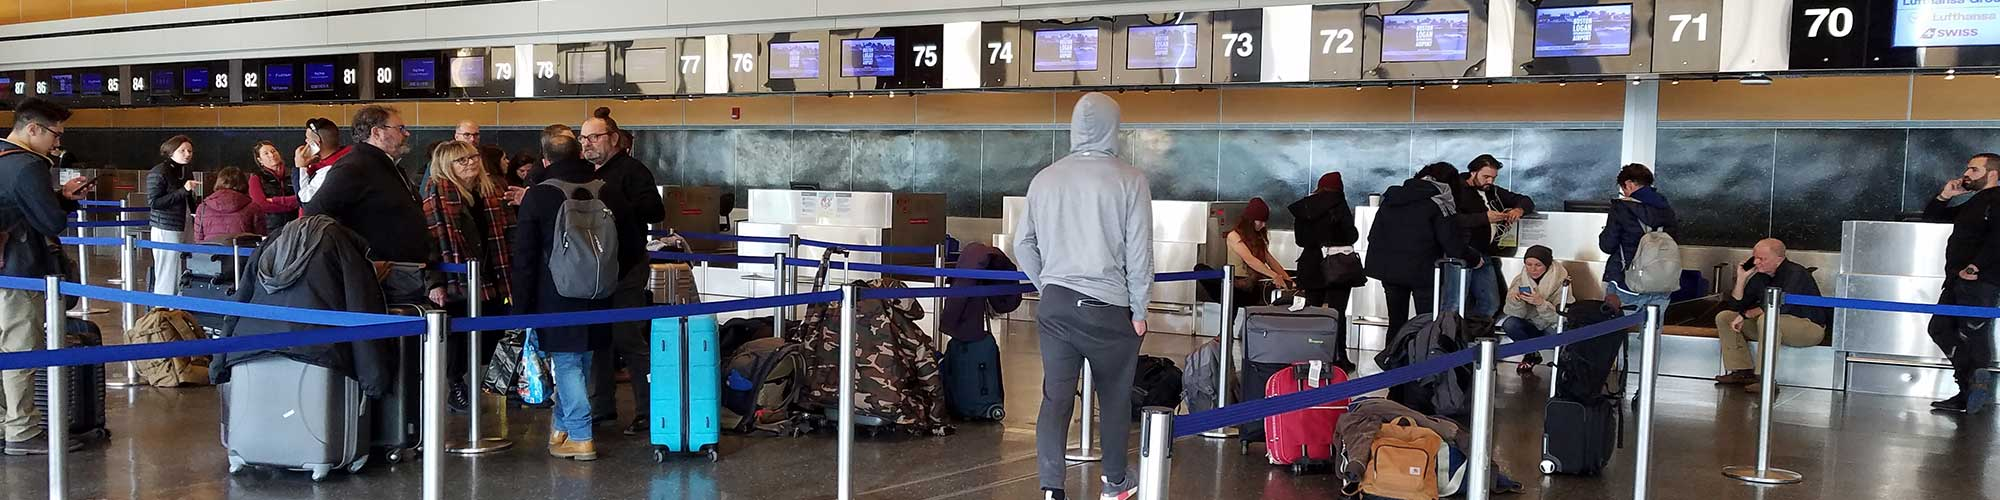 The Stranded Passengers of Iberia Flight 2626